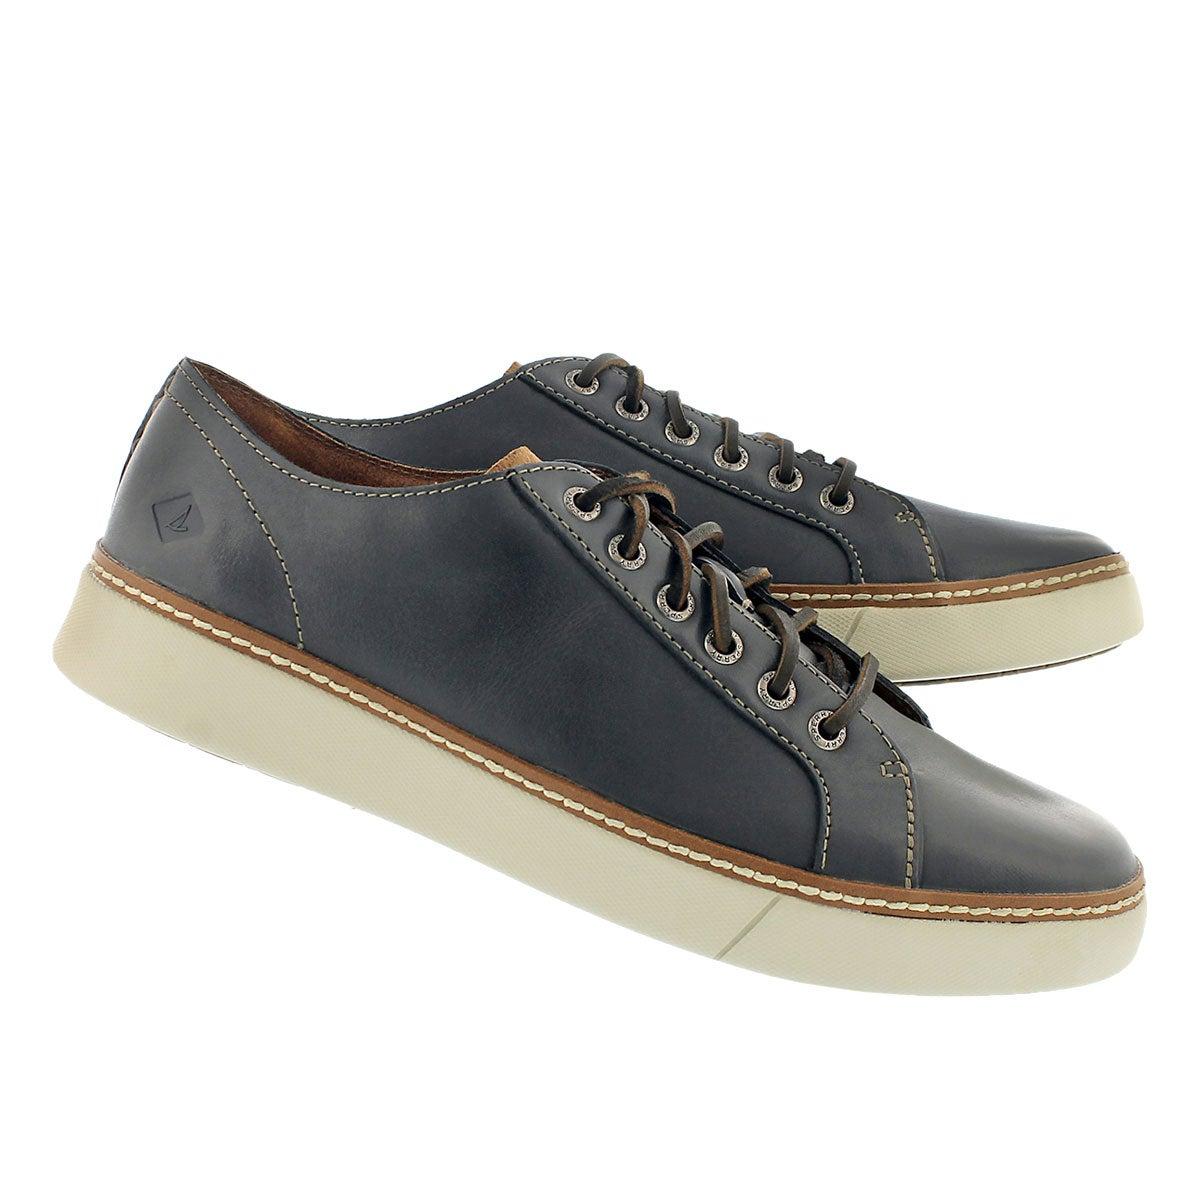 Mns Clipper LTT charcoal lace up sneaker